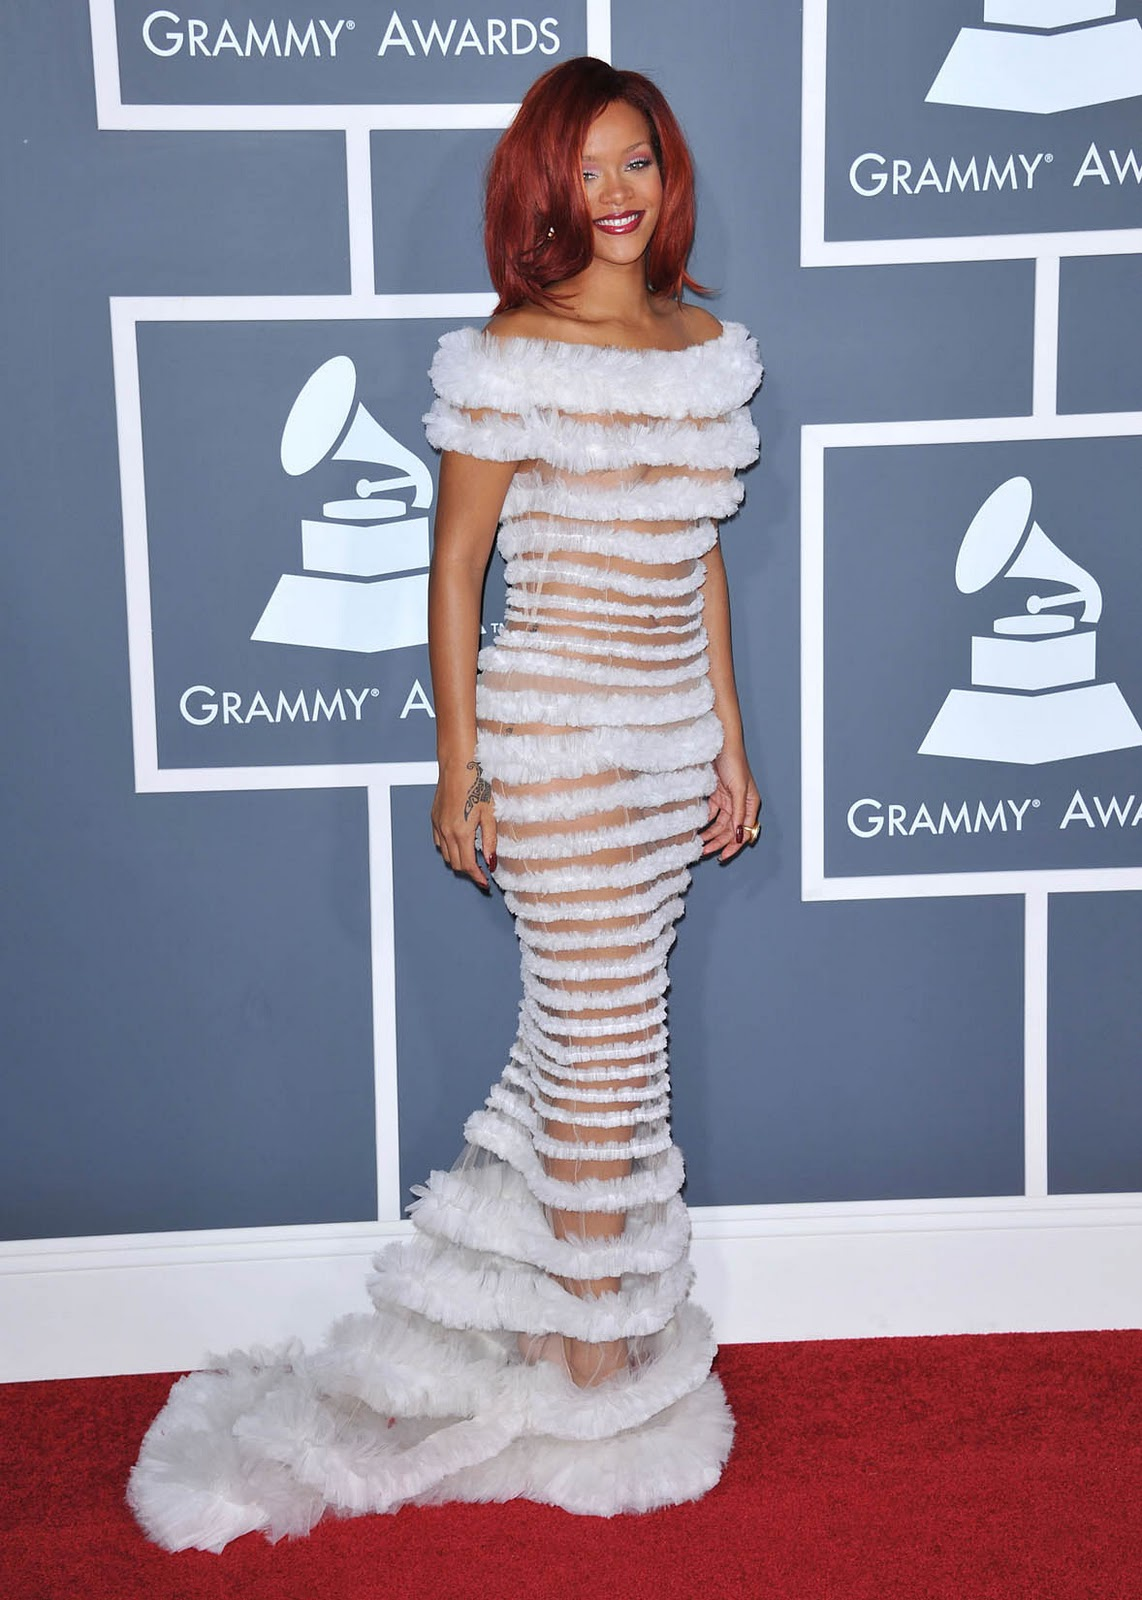 Gwen Stefani - Celebrity Fashionistas - Pictures - CBS News